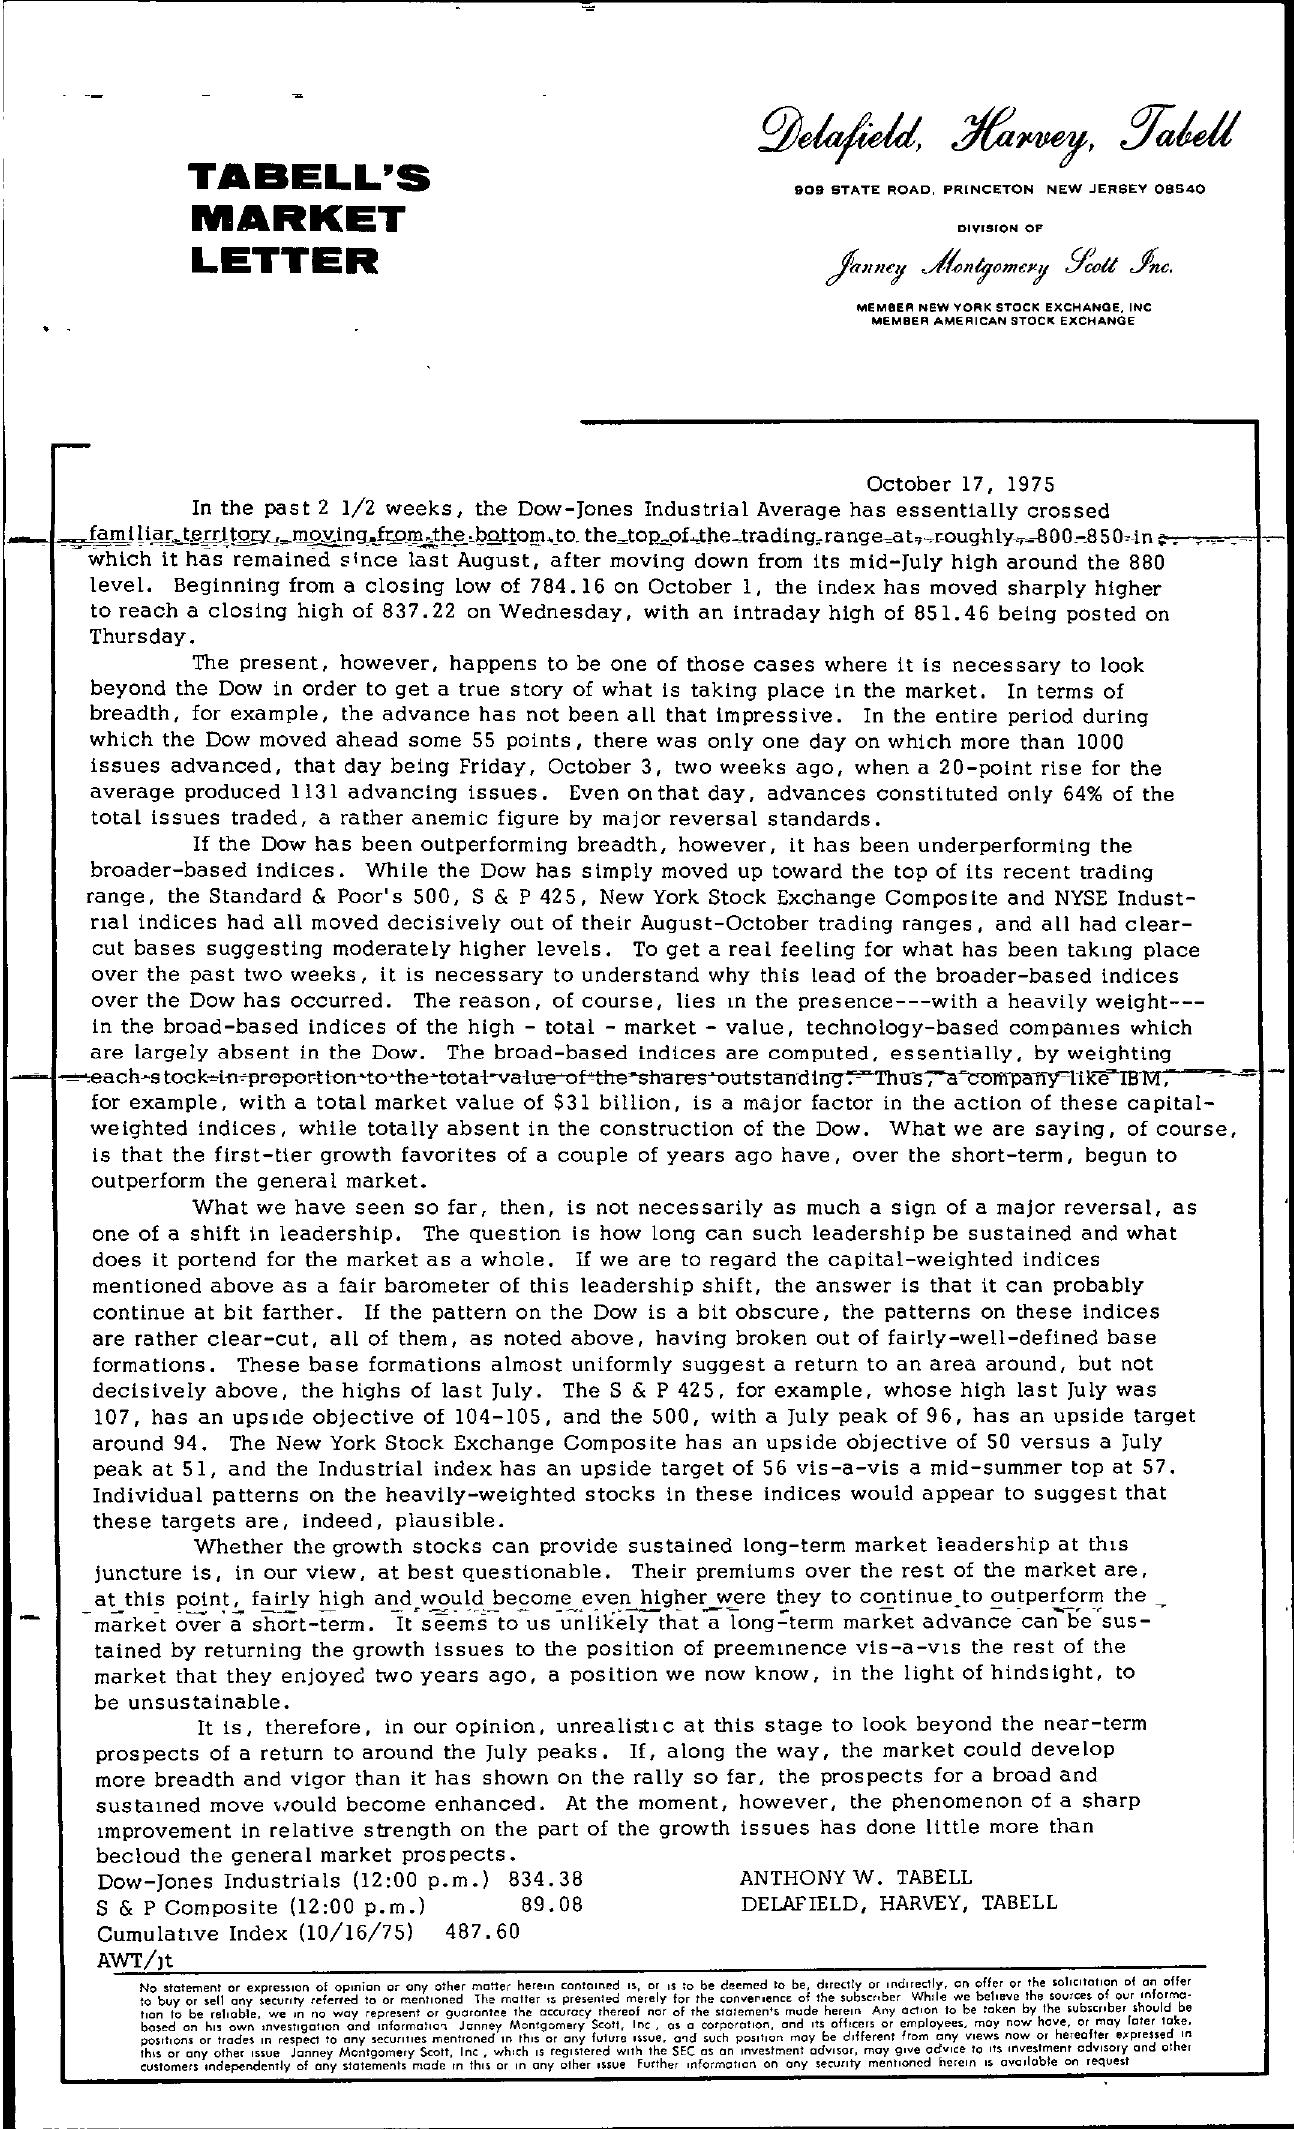 Tabell's Market Letter - October 17, 1975